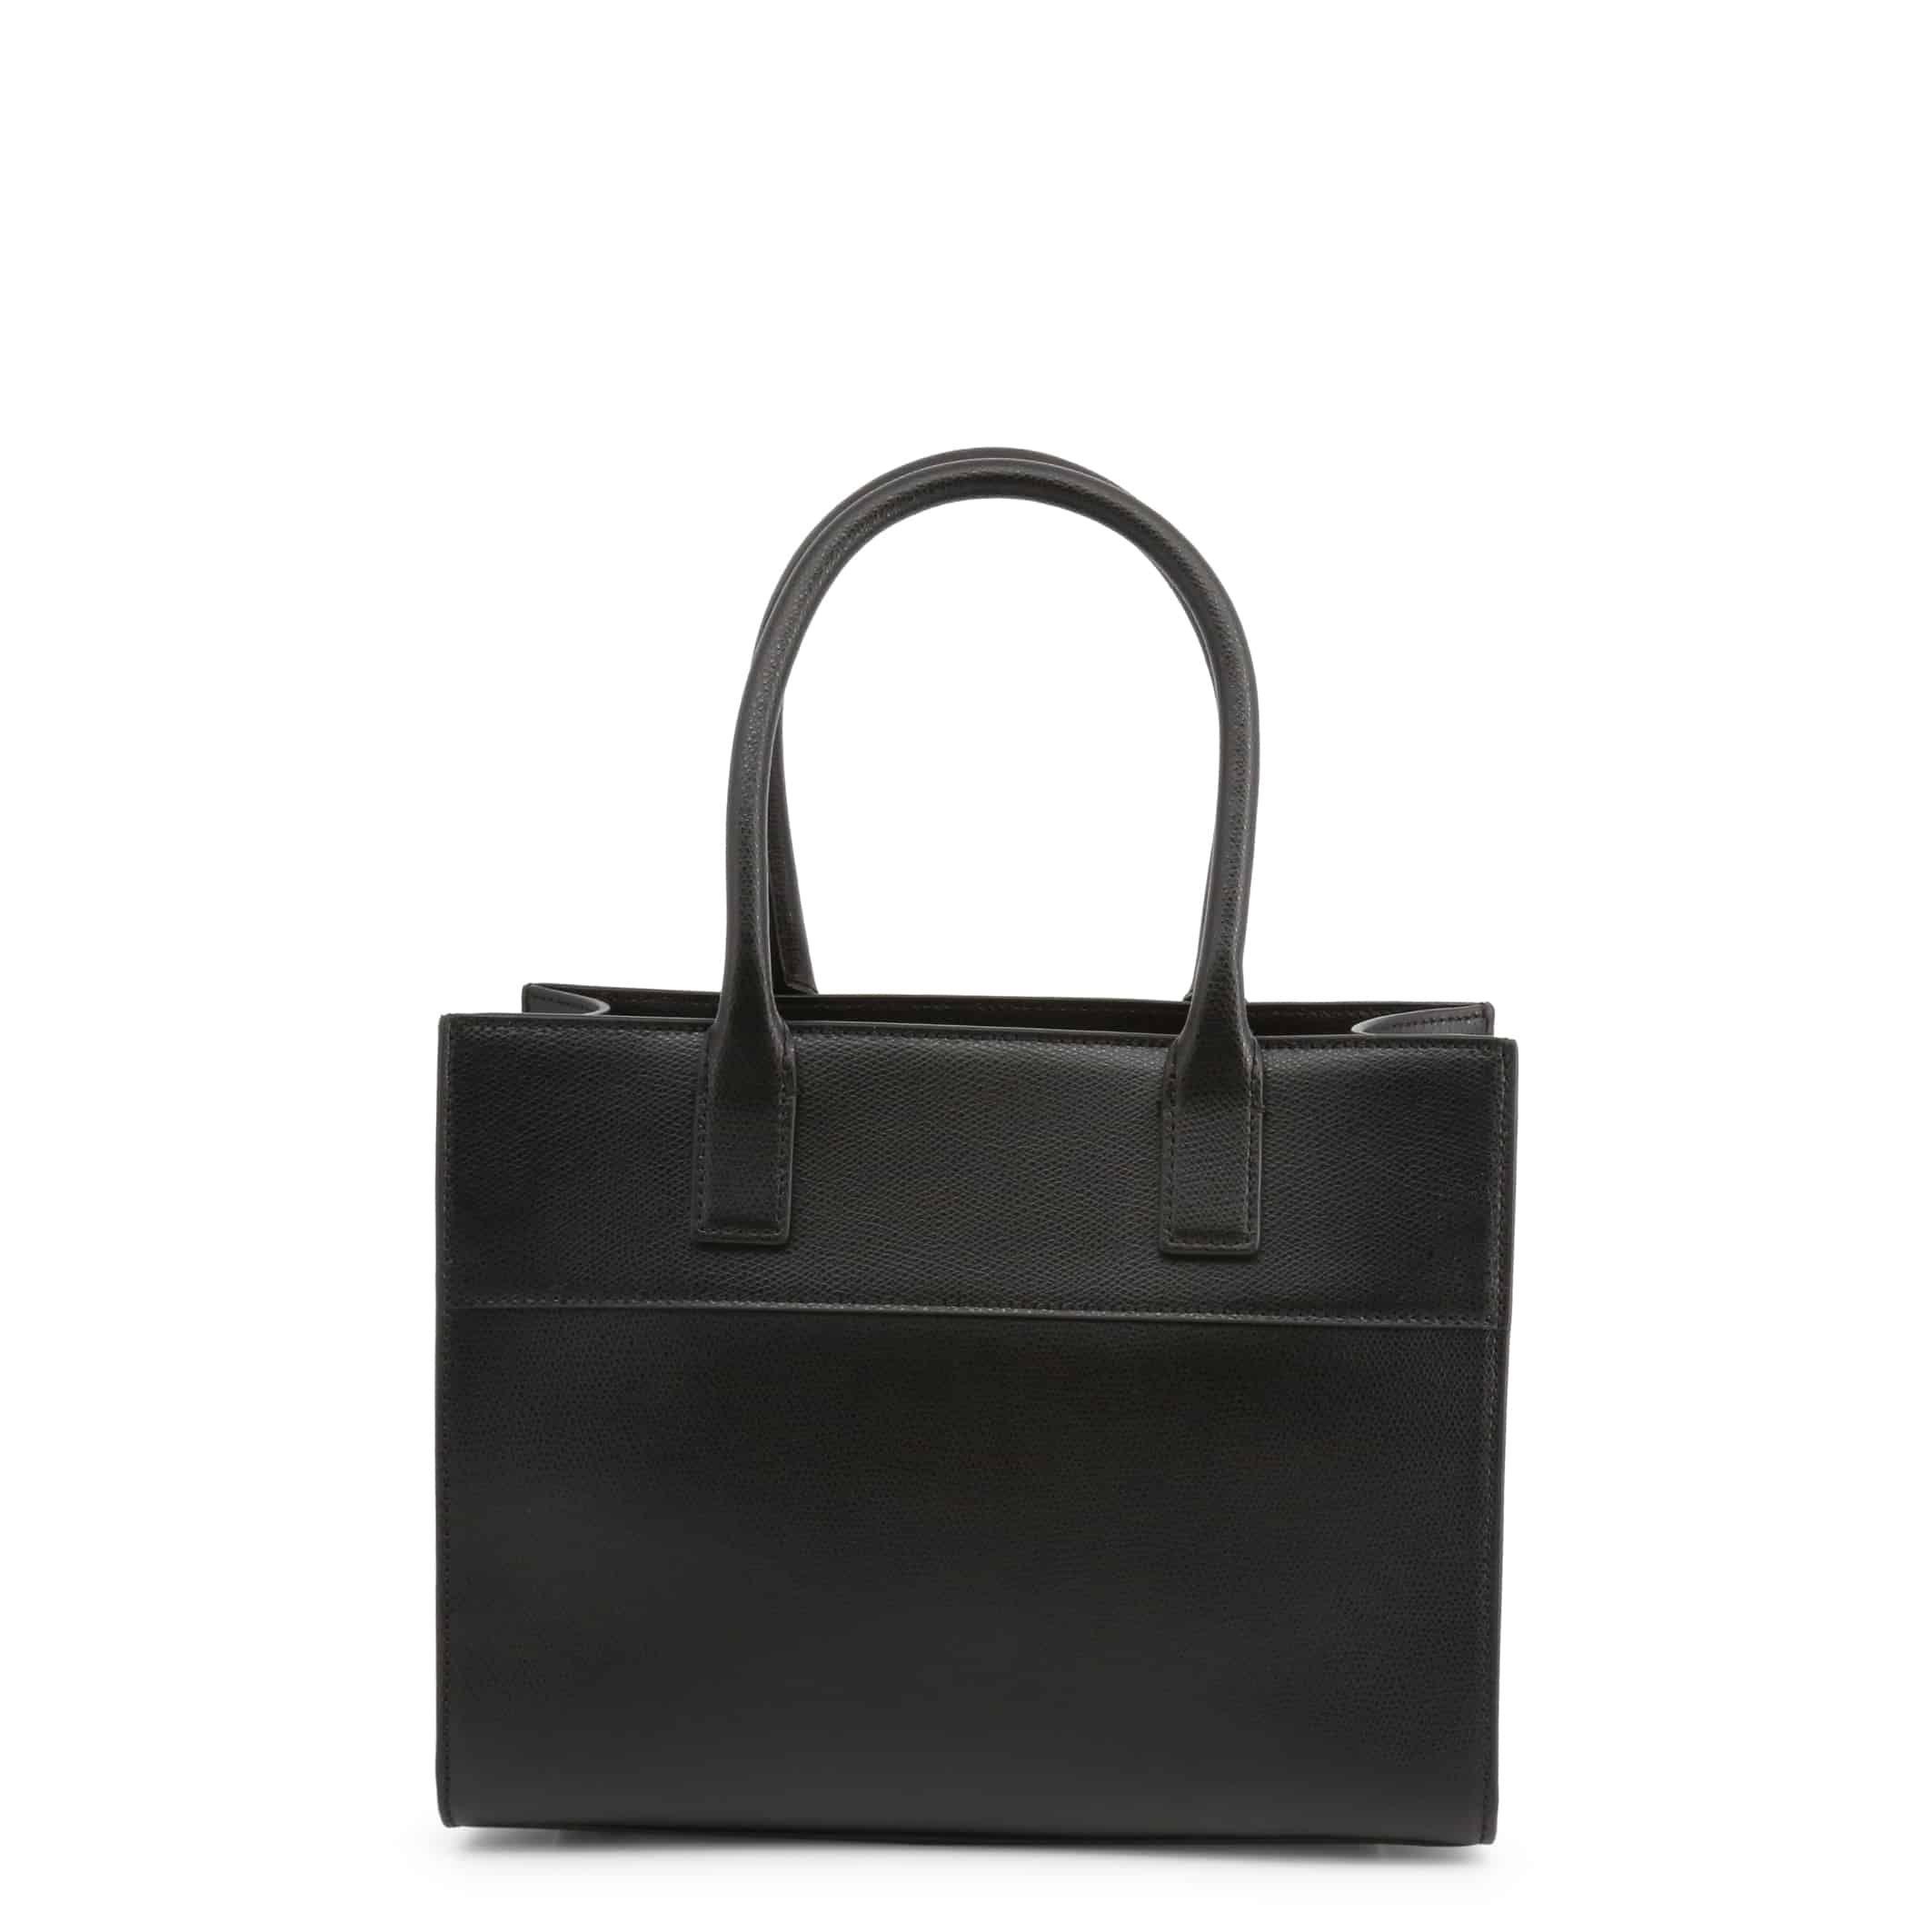 Handtaschen Emporio Armani – Y3A115_YSE2B – Schwarz